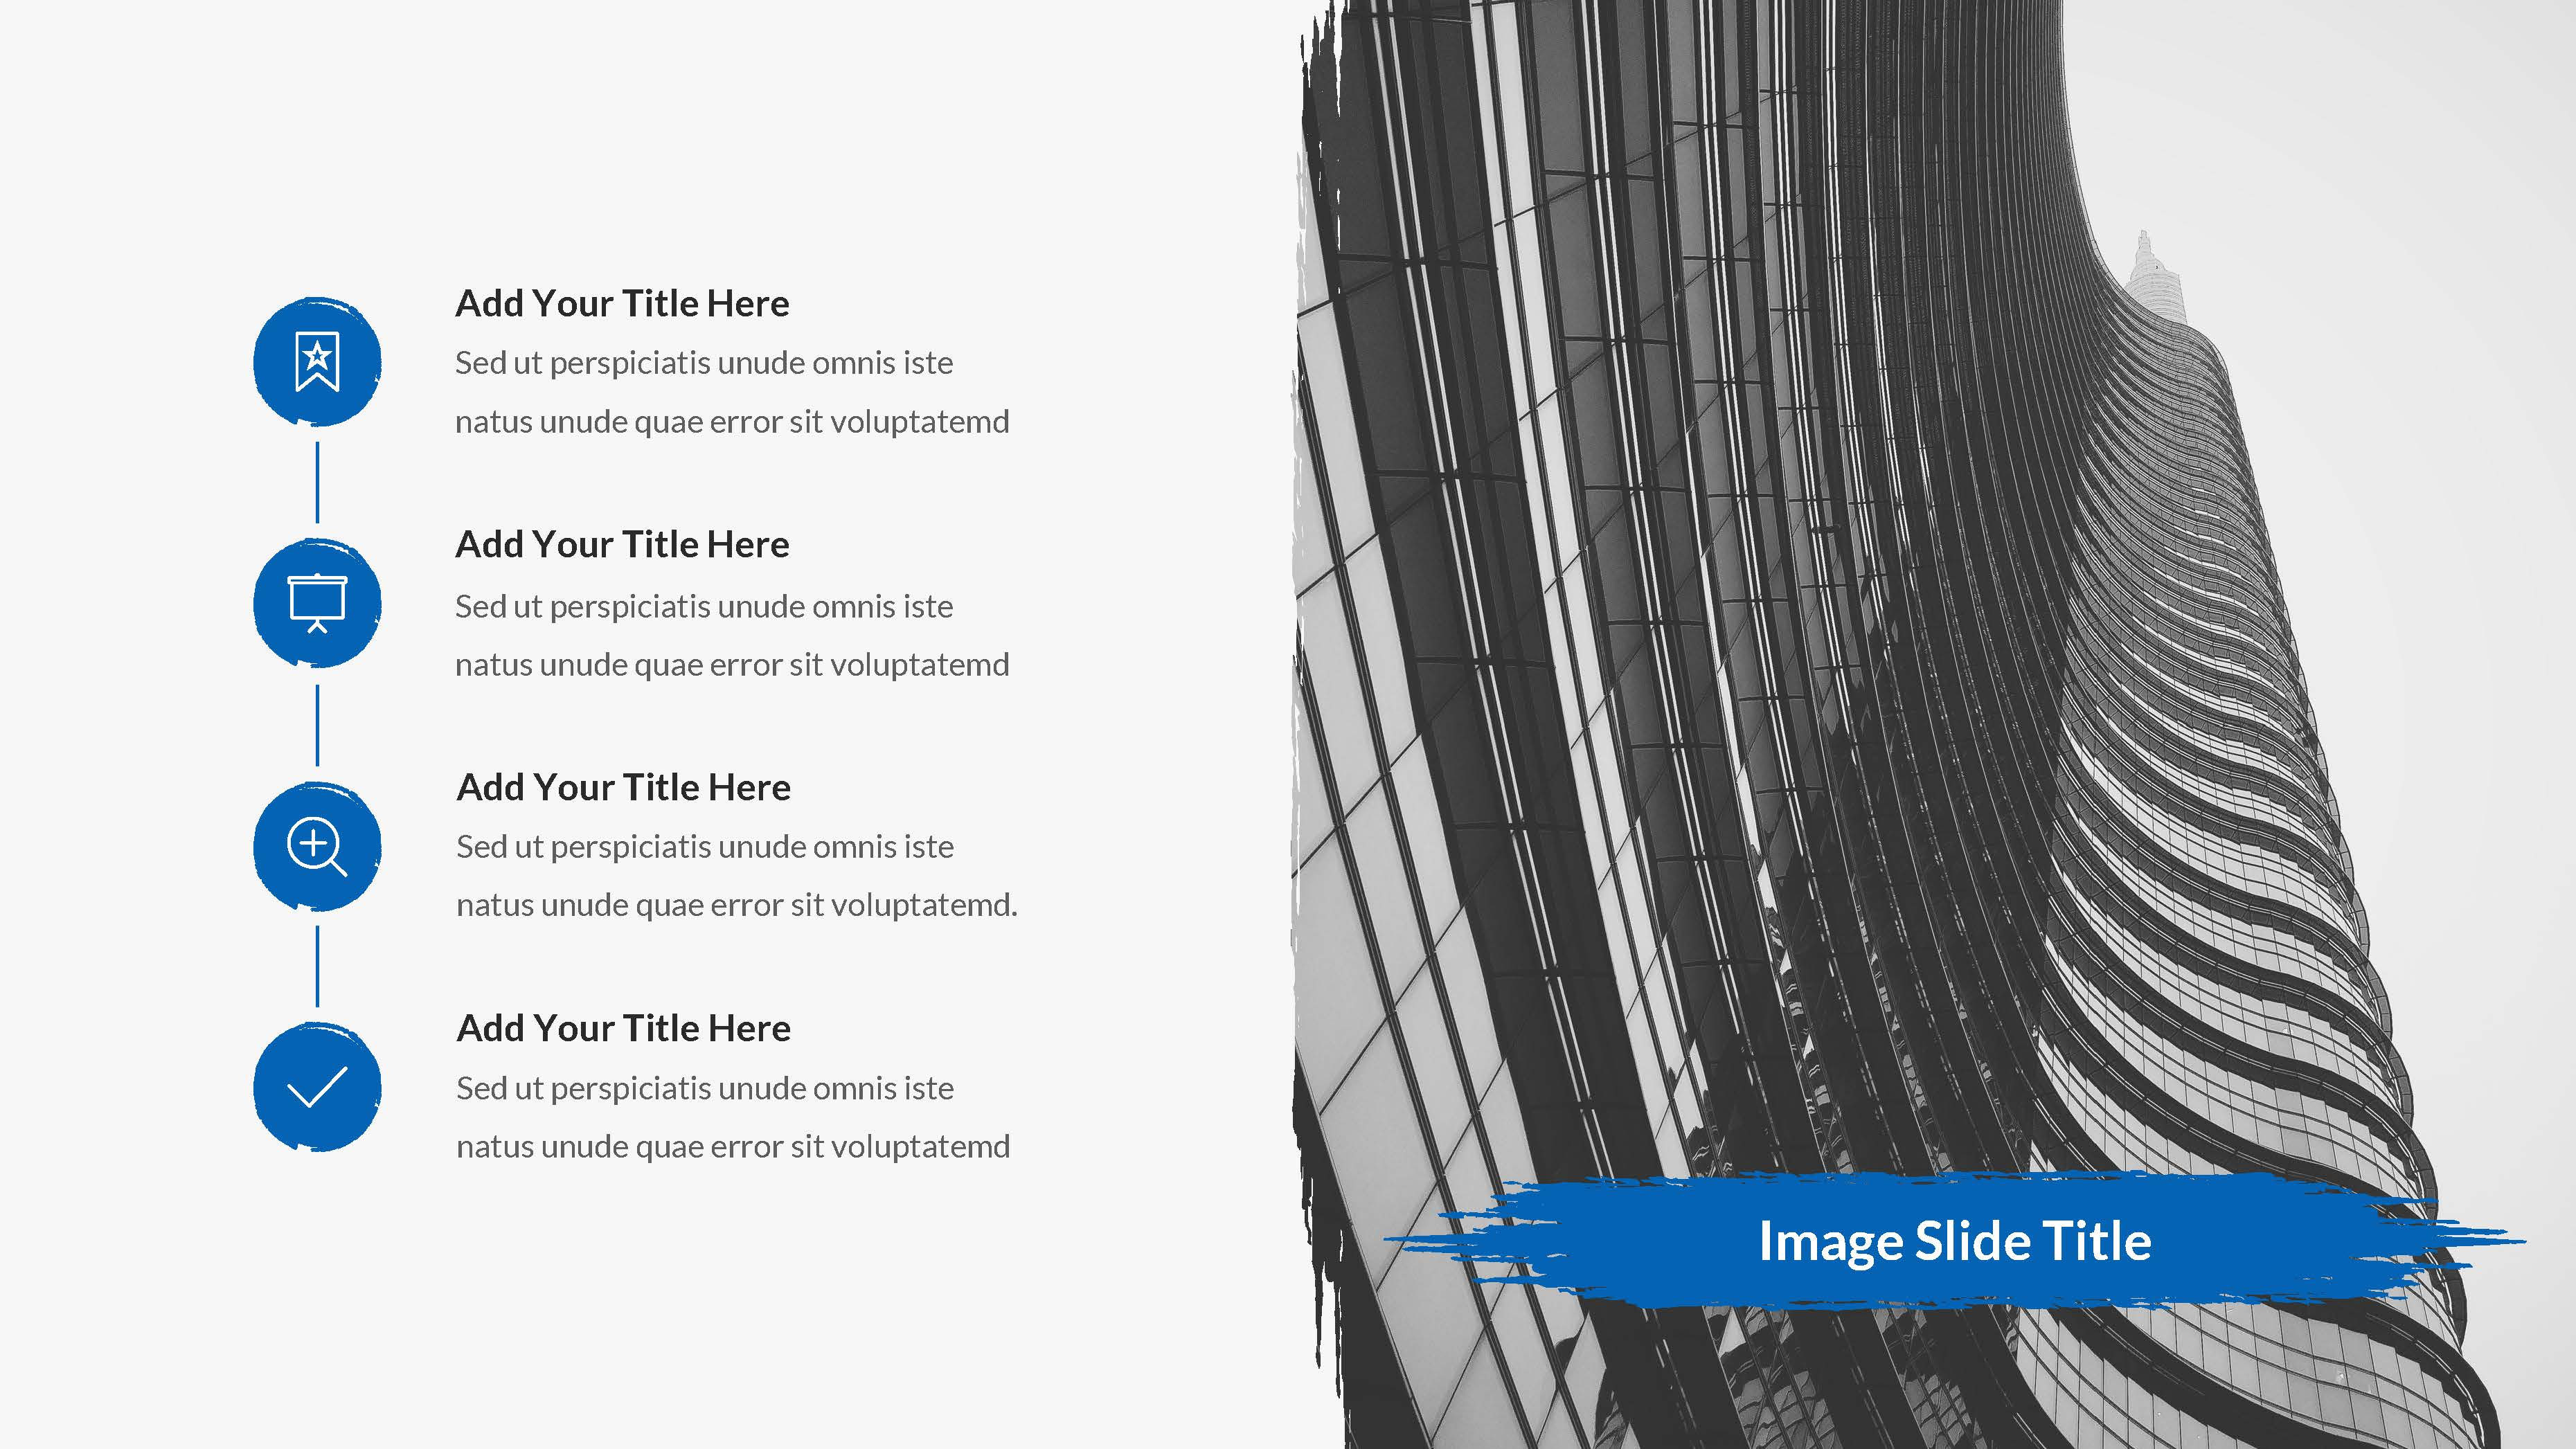 Social Media Marketing Google Slides Pitch Deck by Spriteit ...